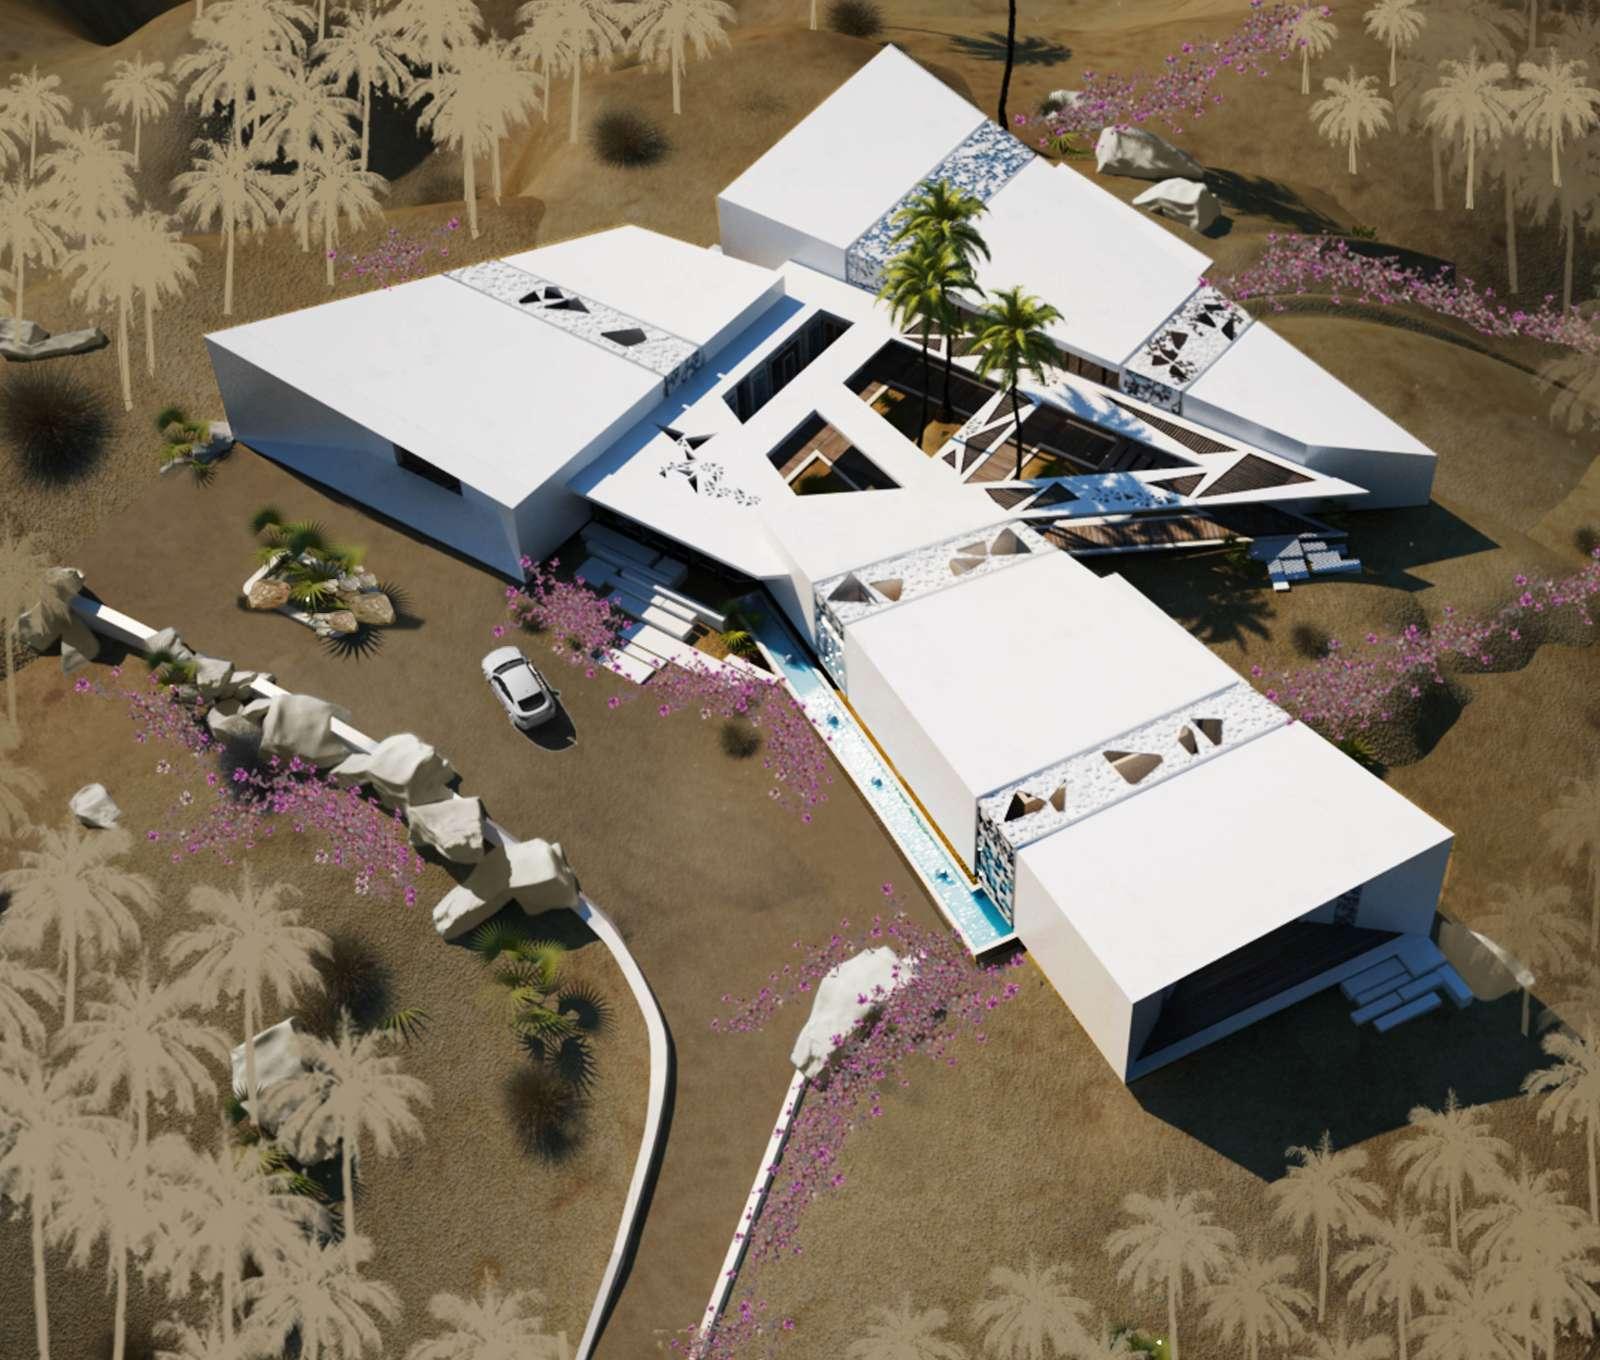 02-Alkhozama-Desert-Casa-de-Ark-Kassam-Arquitectos